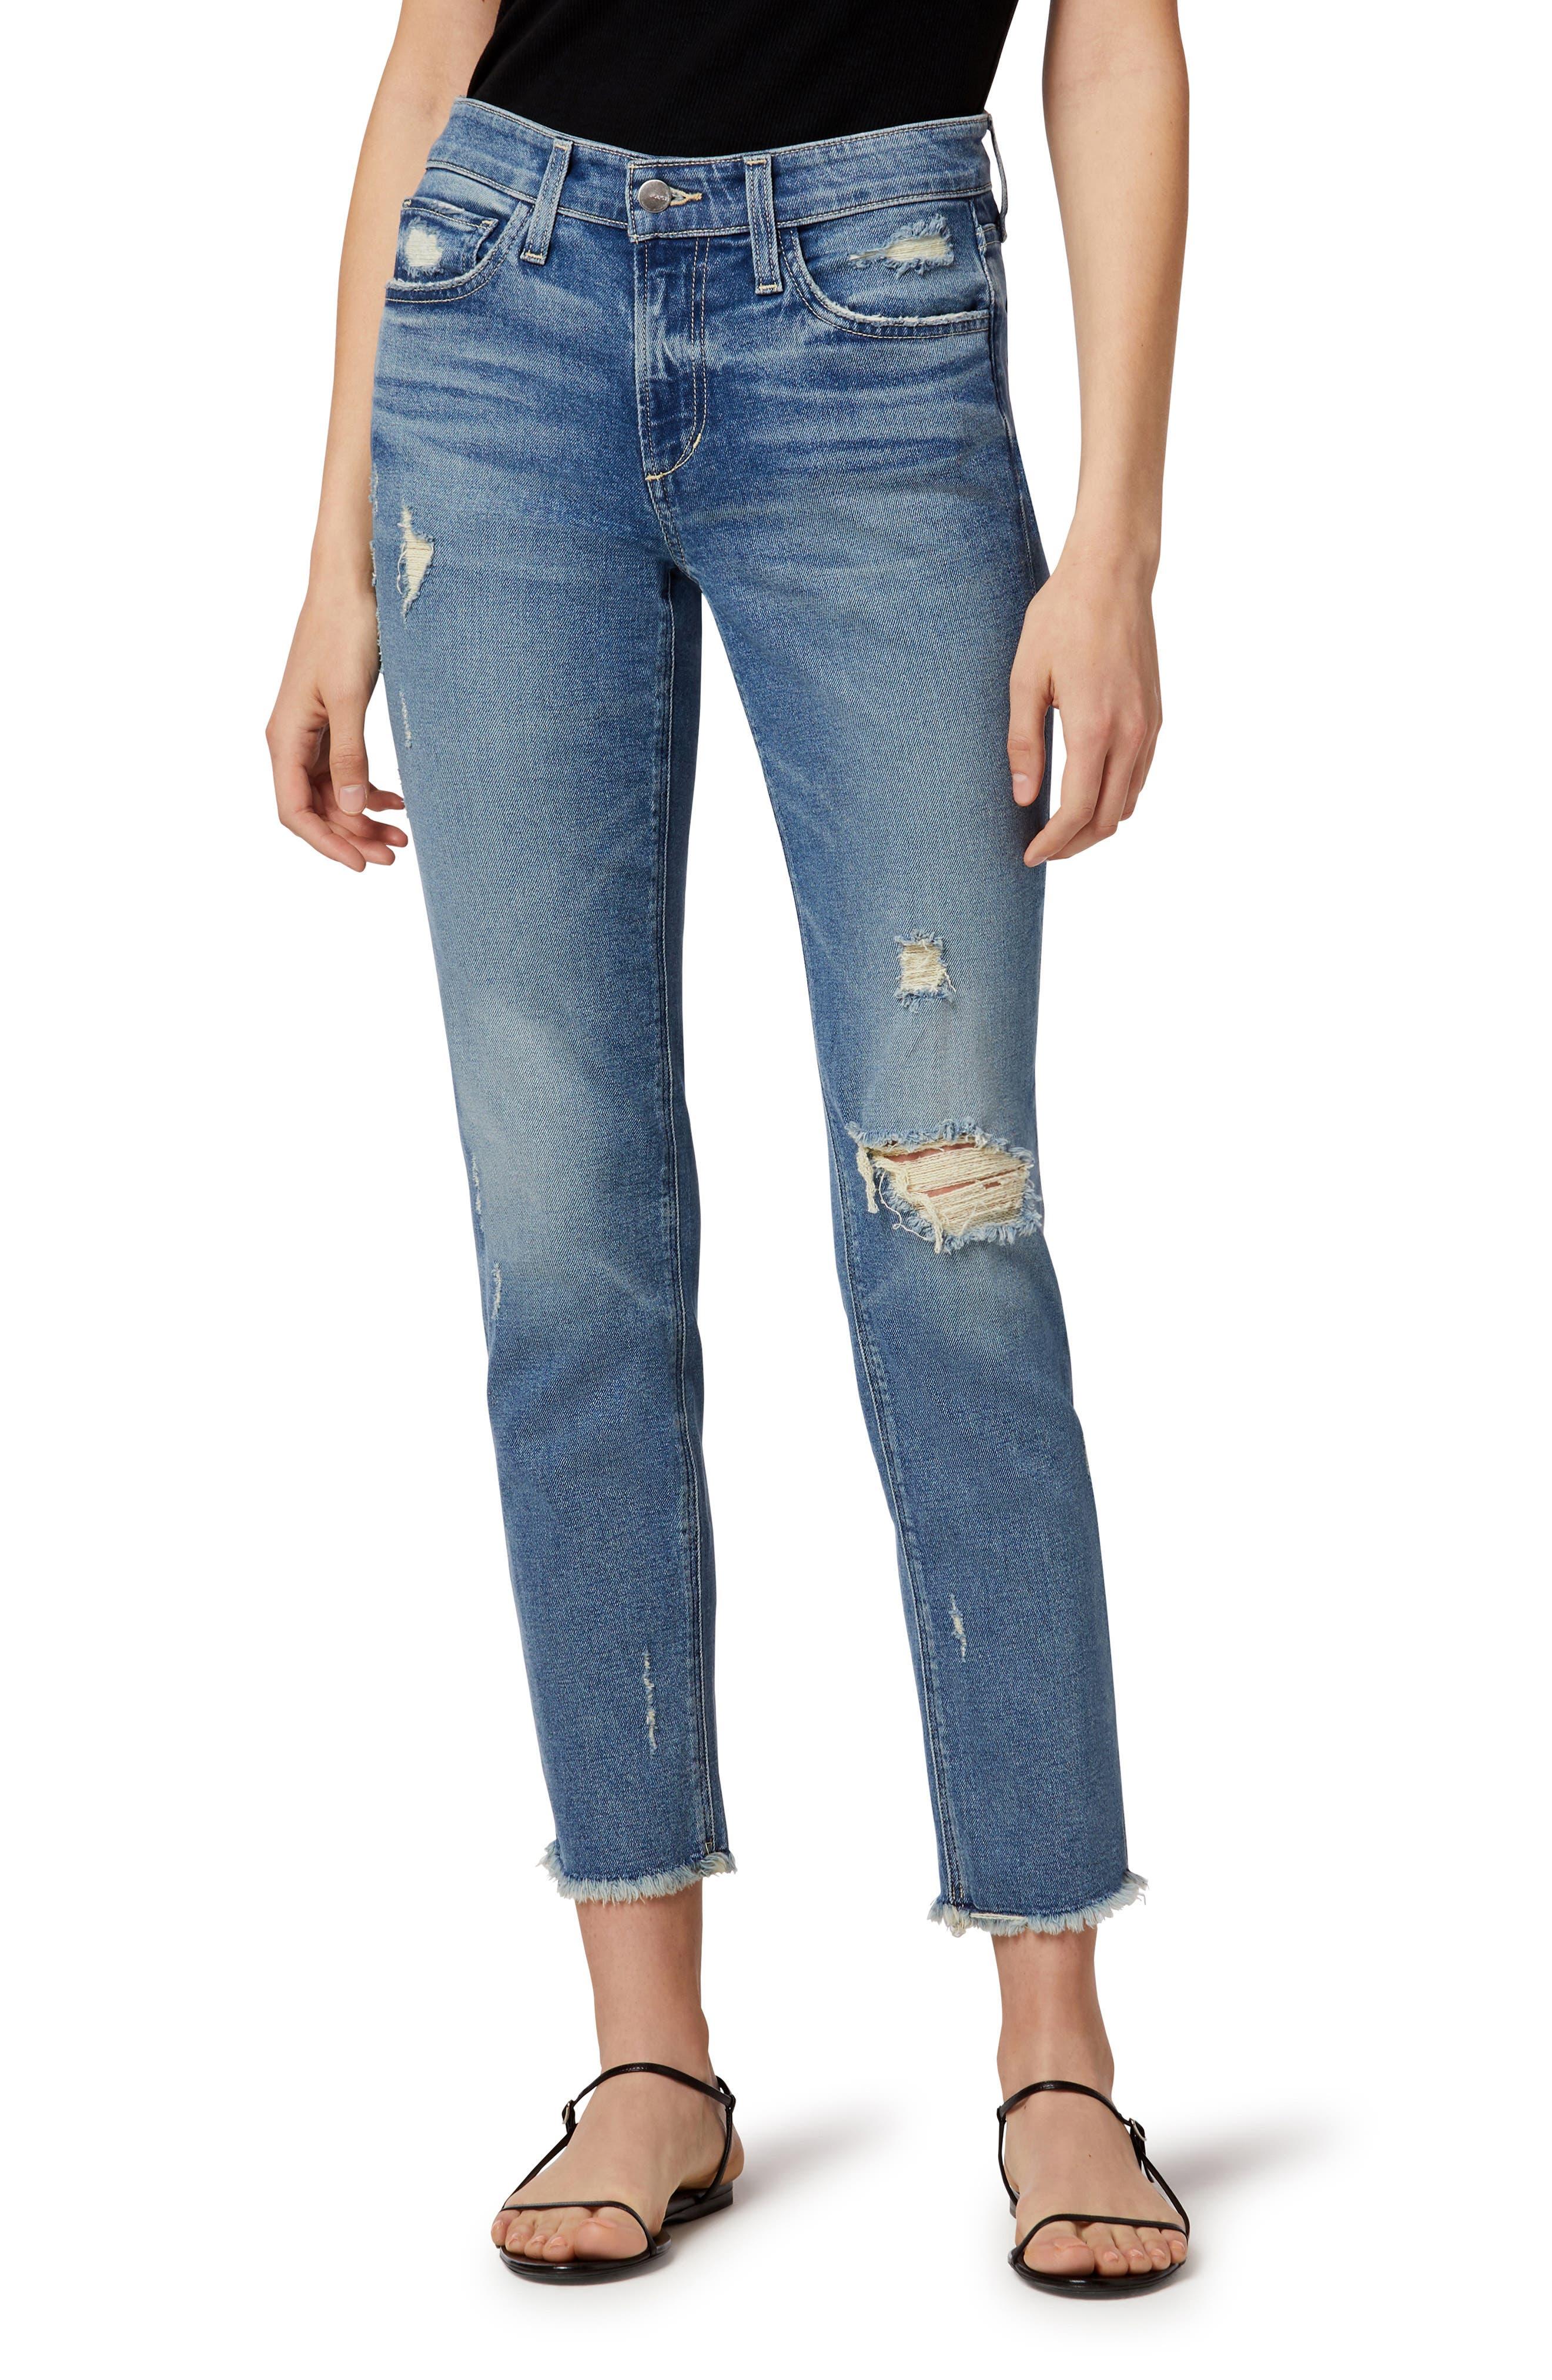 The Lara Distressed Ankle Straight Leg Jeans